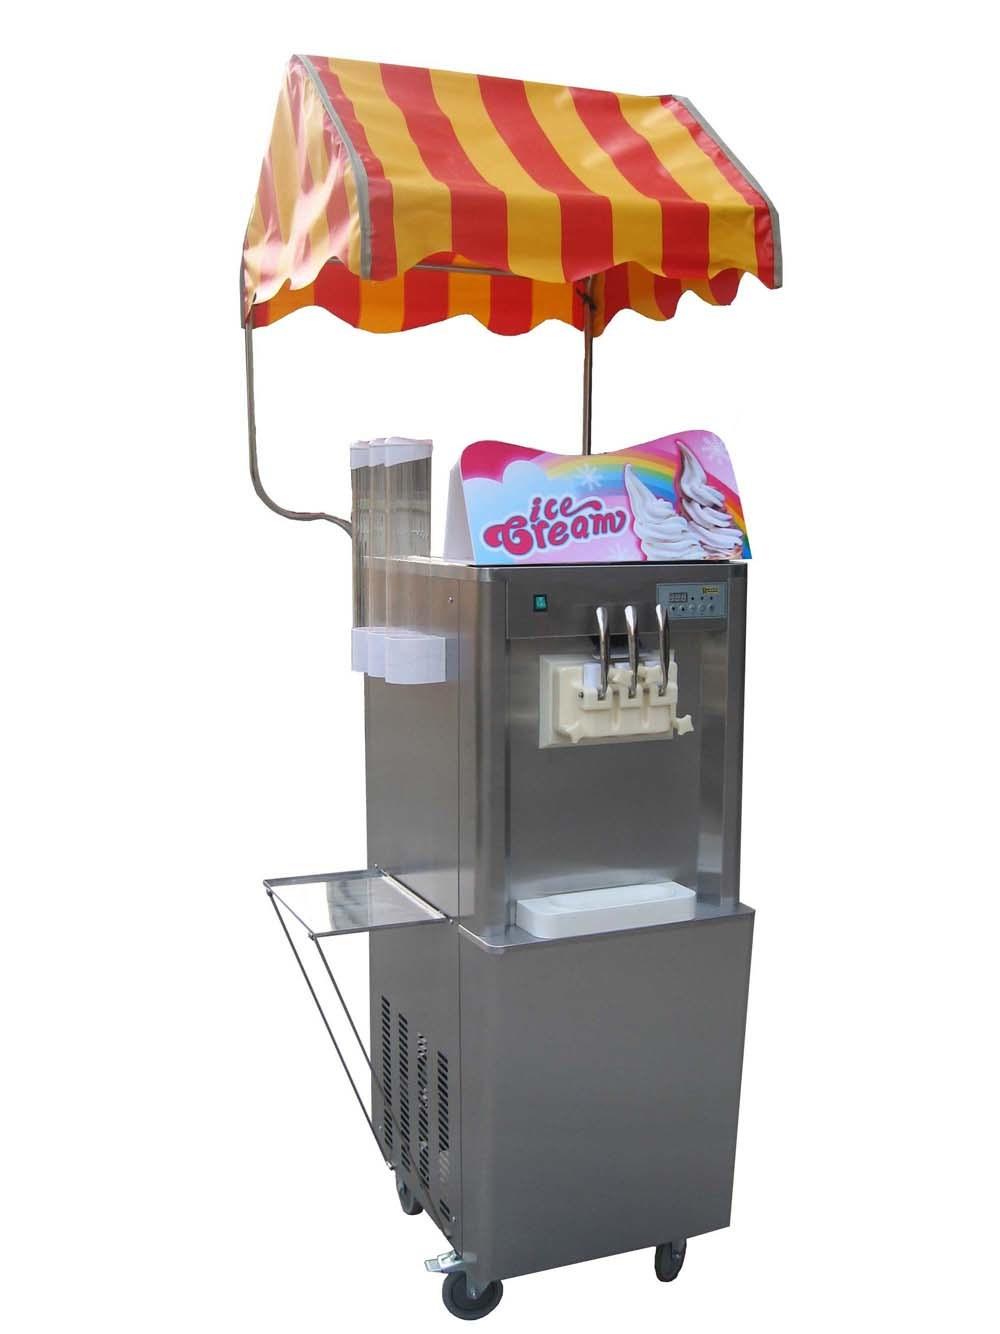 china multifunctional soft ice cream machine bq333m china ice cream maker soft serve ice. Black Bedroom Furniture Sets. Home Design Ideas